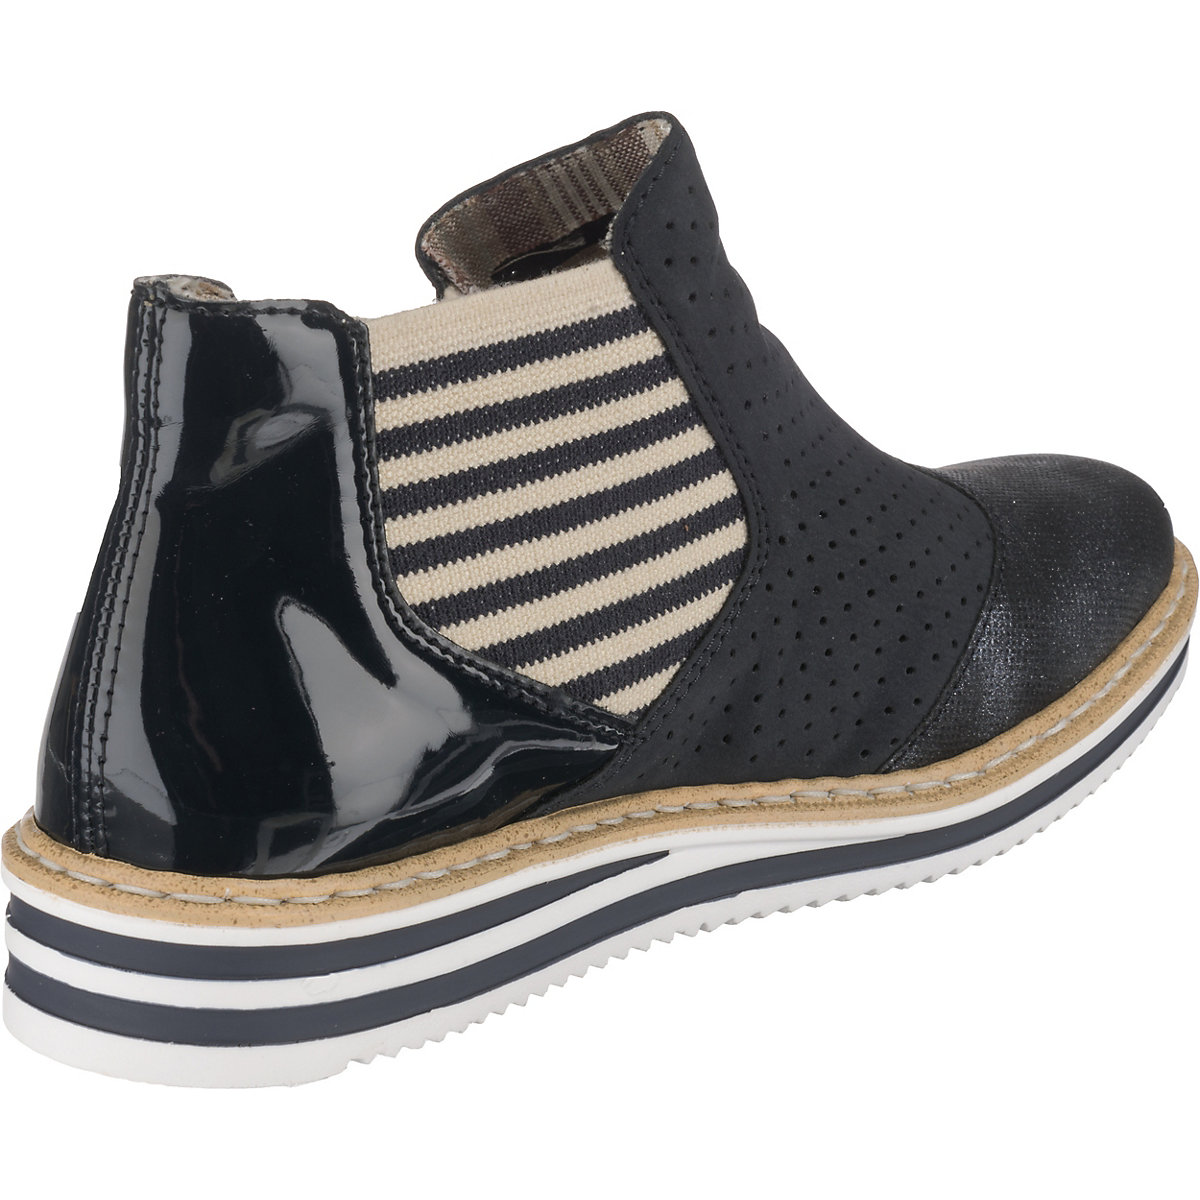 Rieker, Chelsea Boots, Dunkelblau